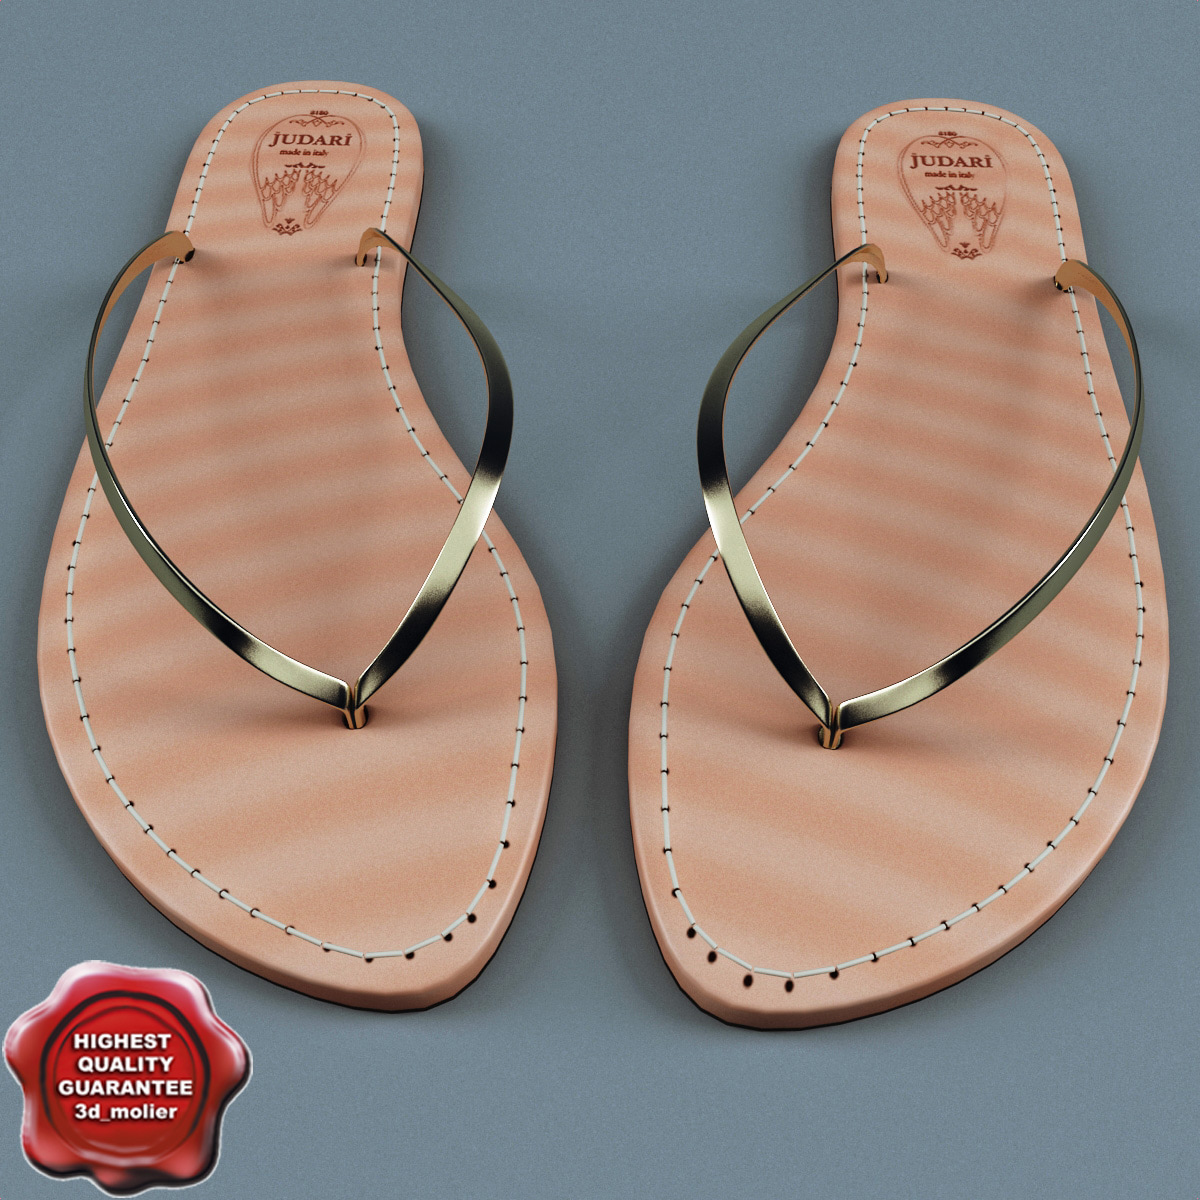 Summer_Shoes_Judari_00.jpg